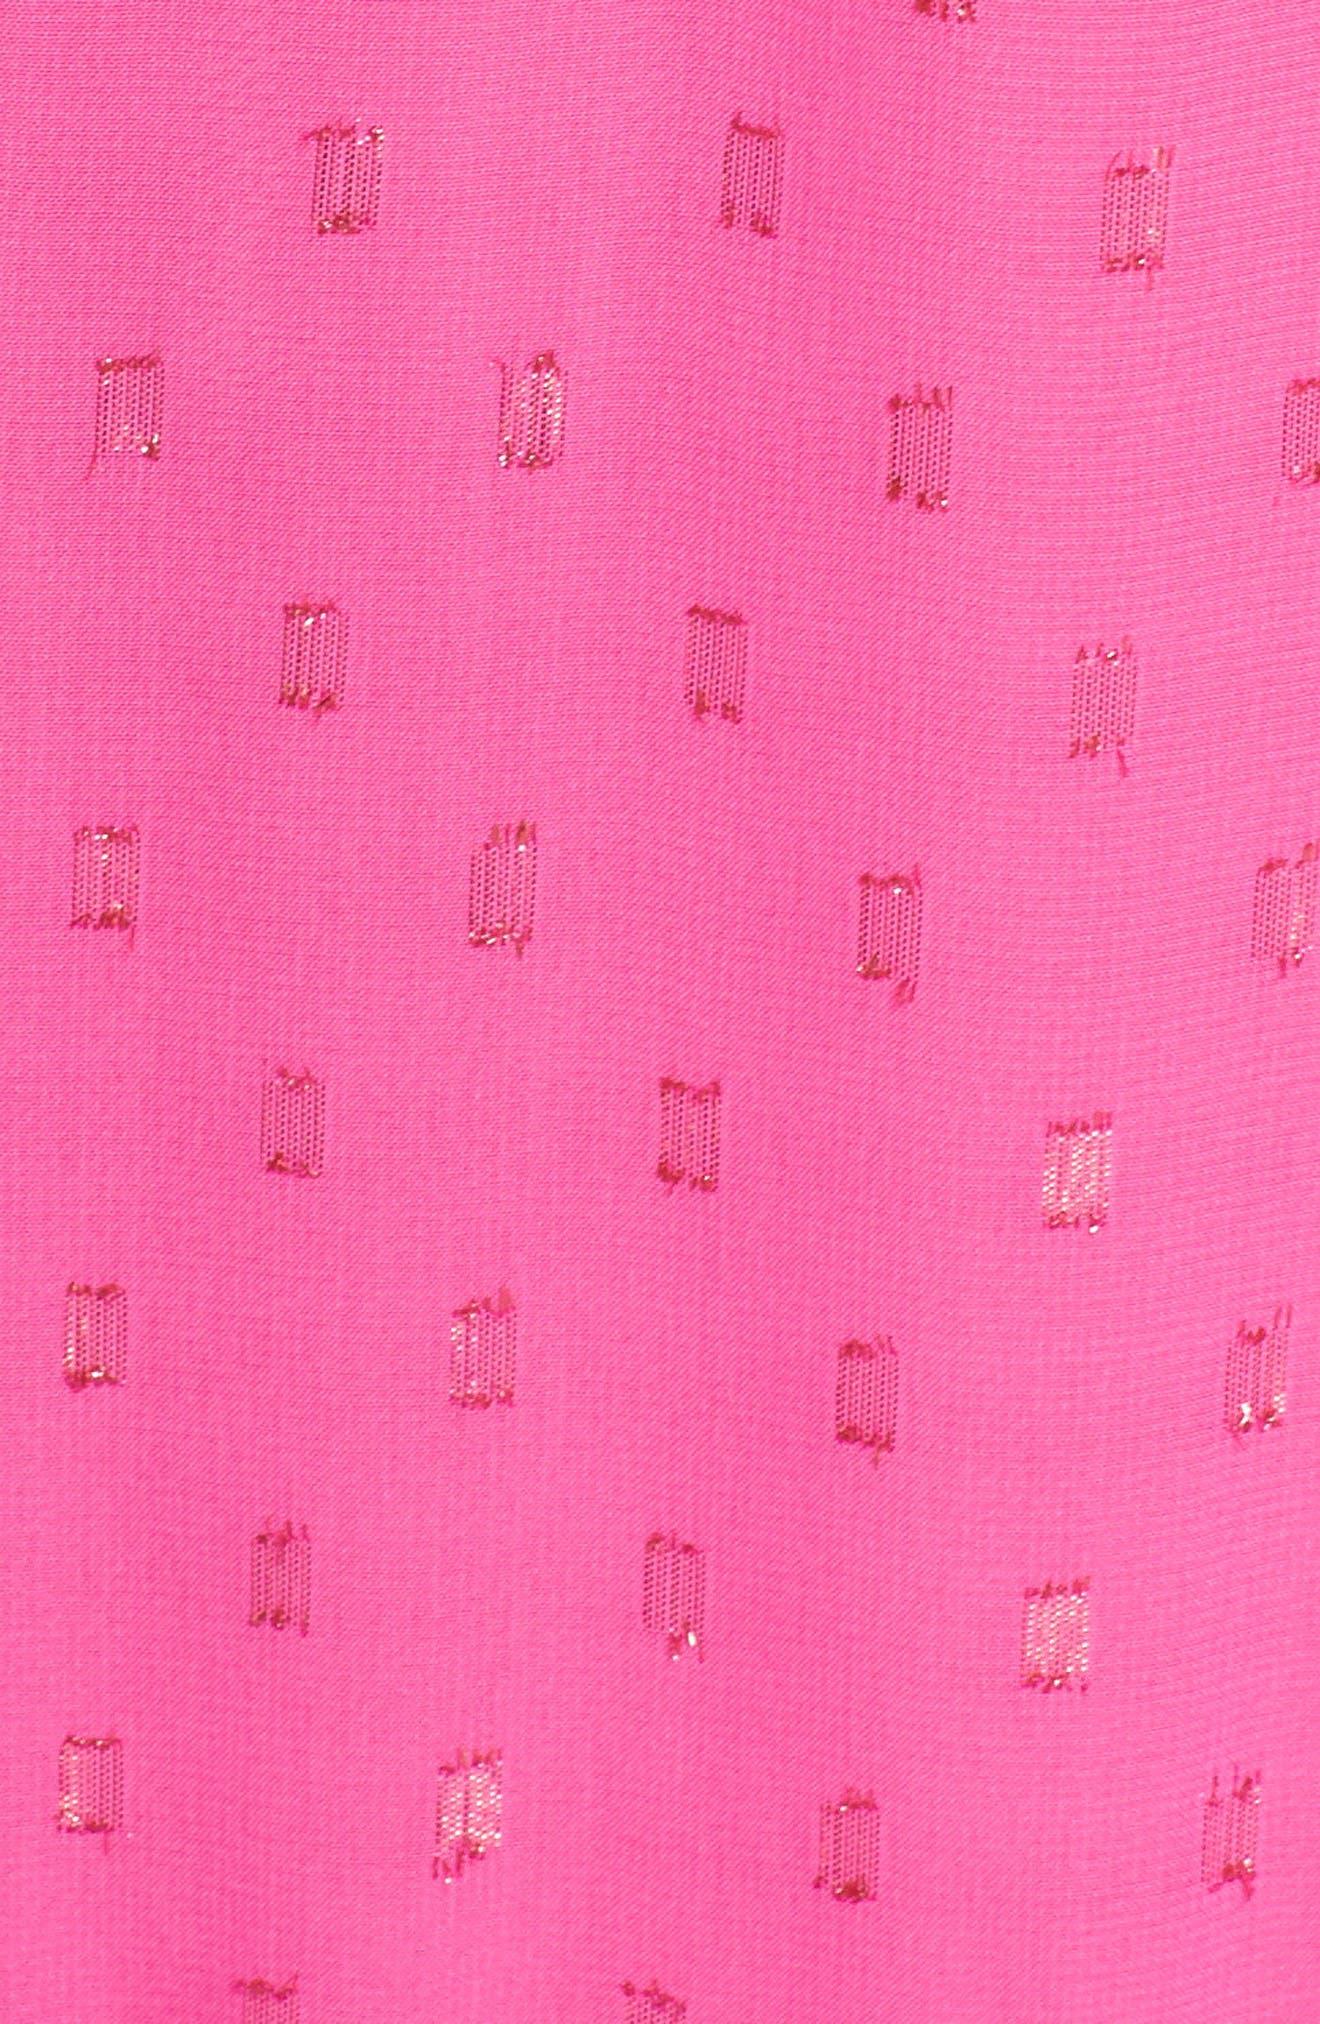 Bodega Bay Chiffon Shift Dress,                             Alternate thumbnail 6, color,                             BRILLIANT FUCHSIA